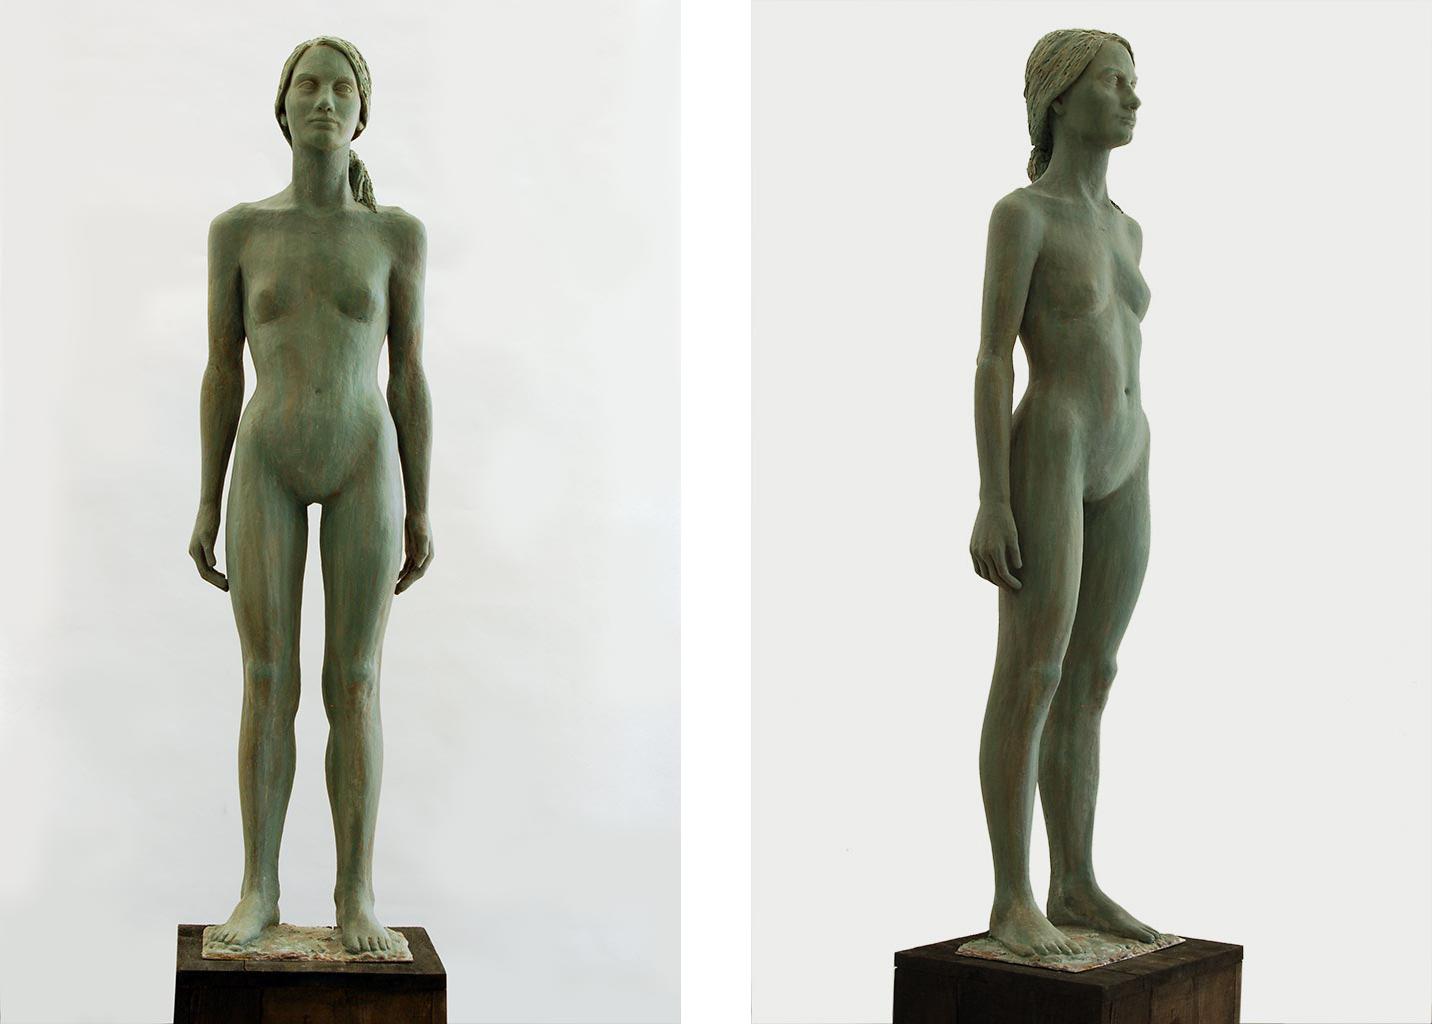 Lena, Alabastergips, 130x31x22 cm, 2020